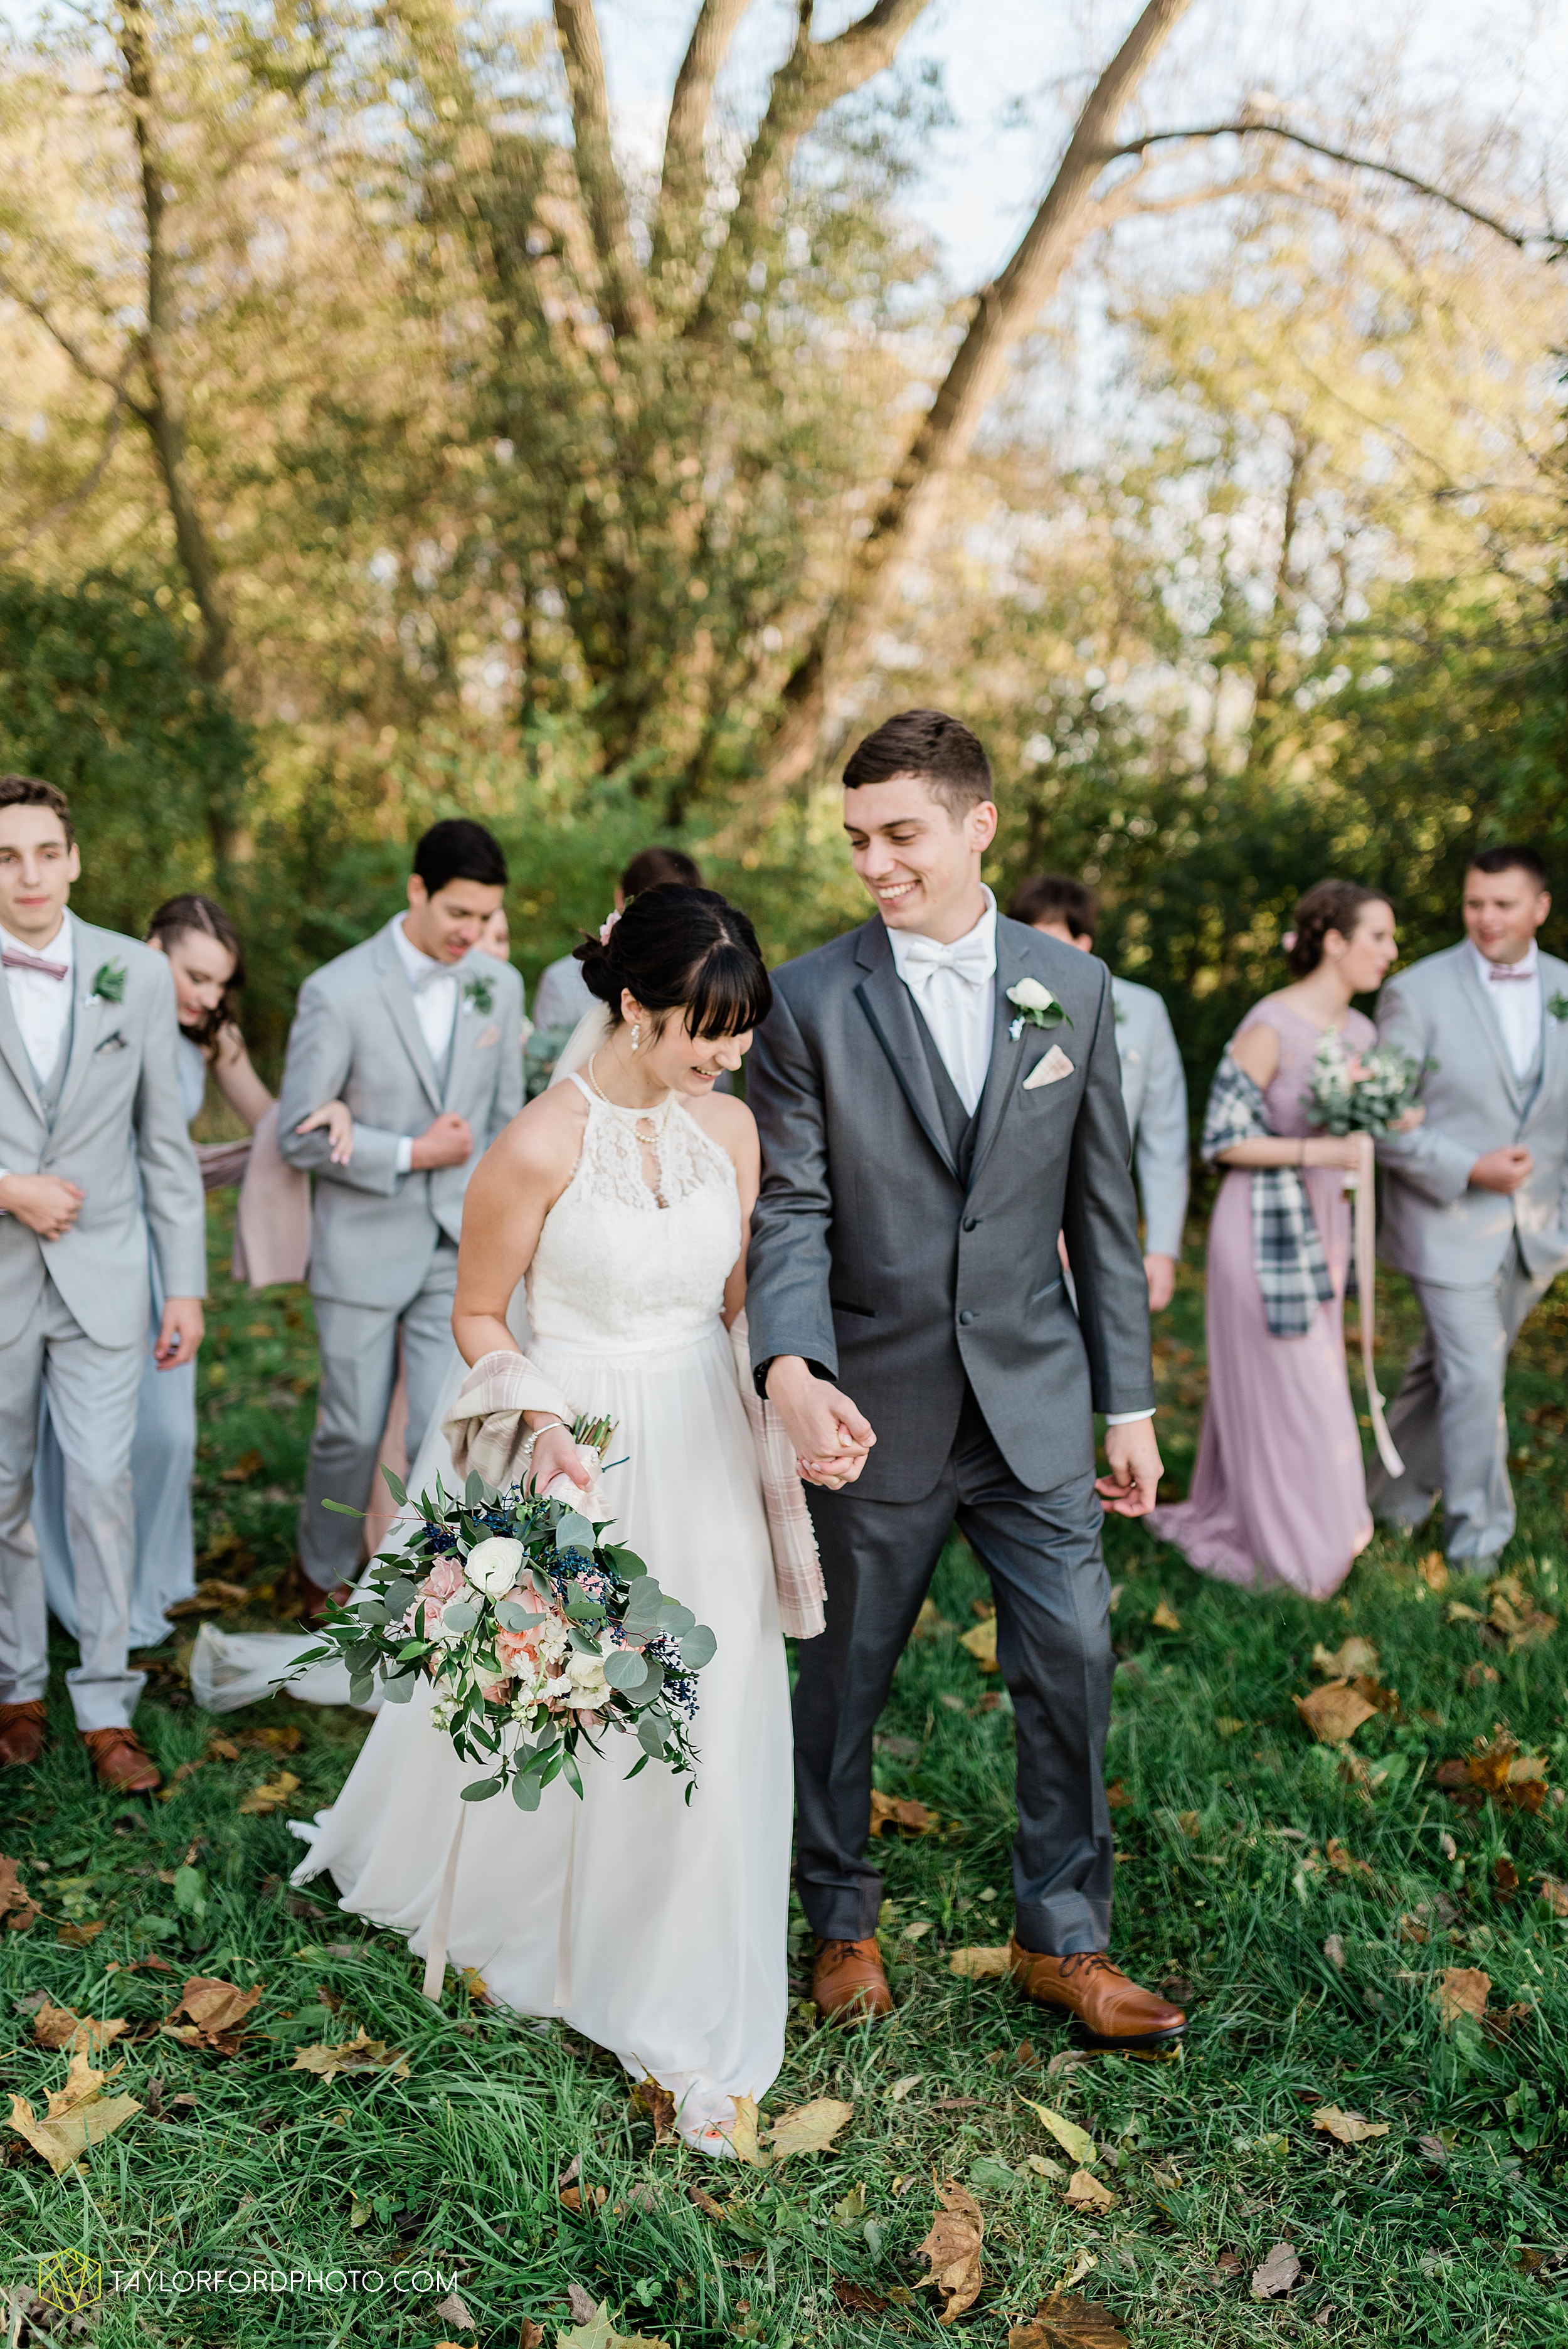 marissa-nicole-nick-daeger-orrmont-estate-farm-wedding-piqua-dayton-troy-ohio-fall-photographer-taylor-ford-photography_1536.jpg